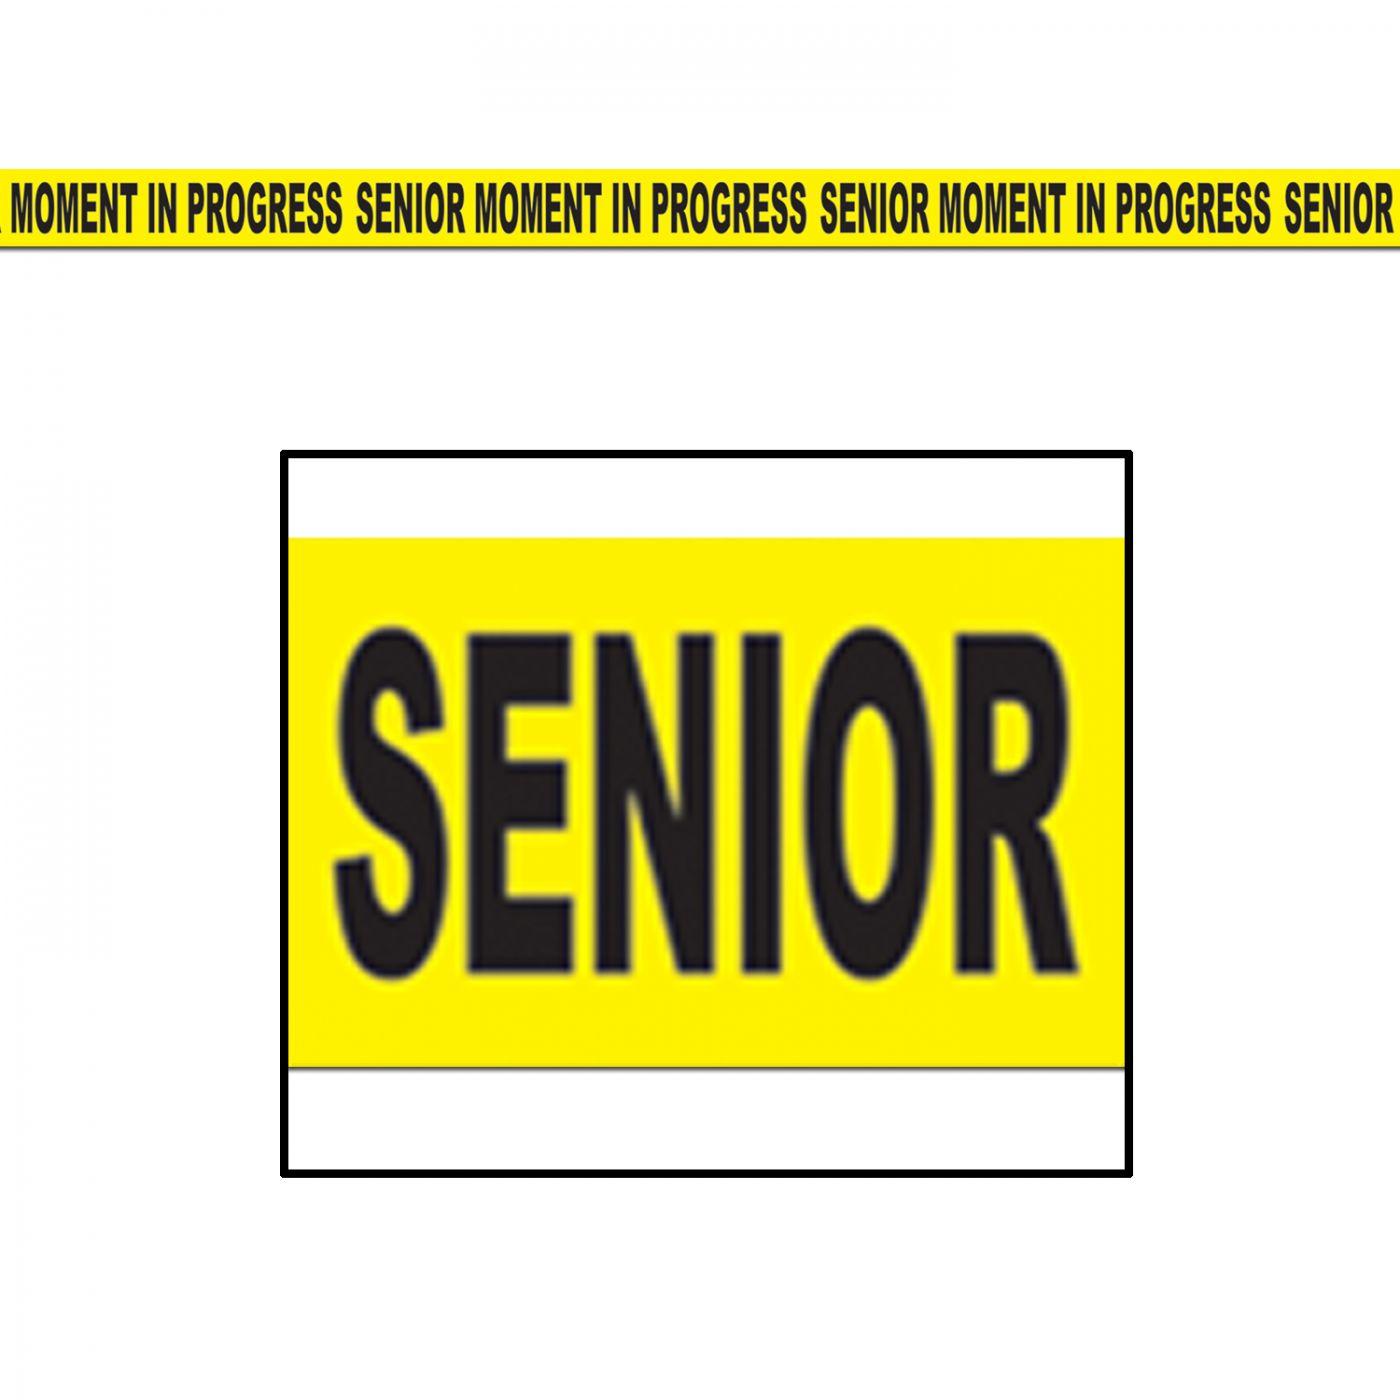 Senior Moment In Progress Party Tape image